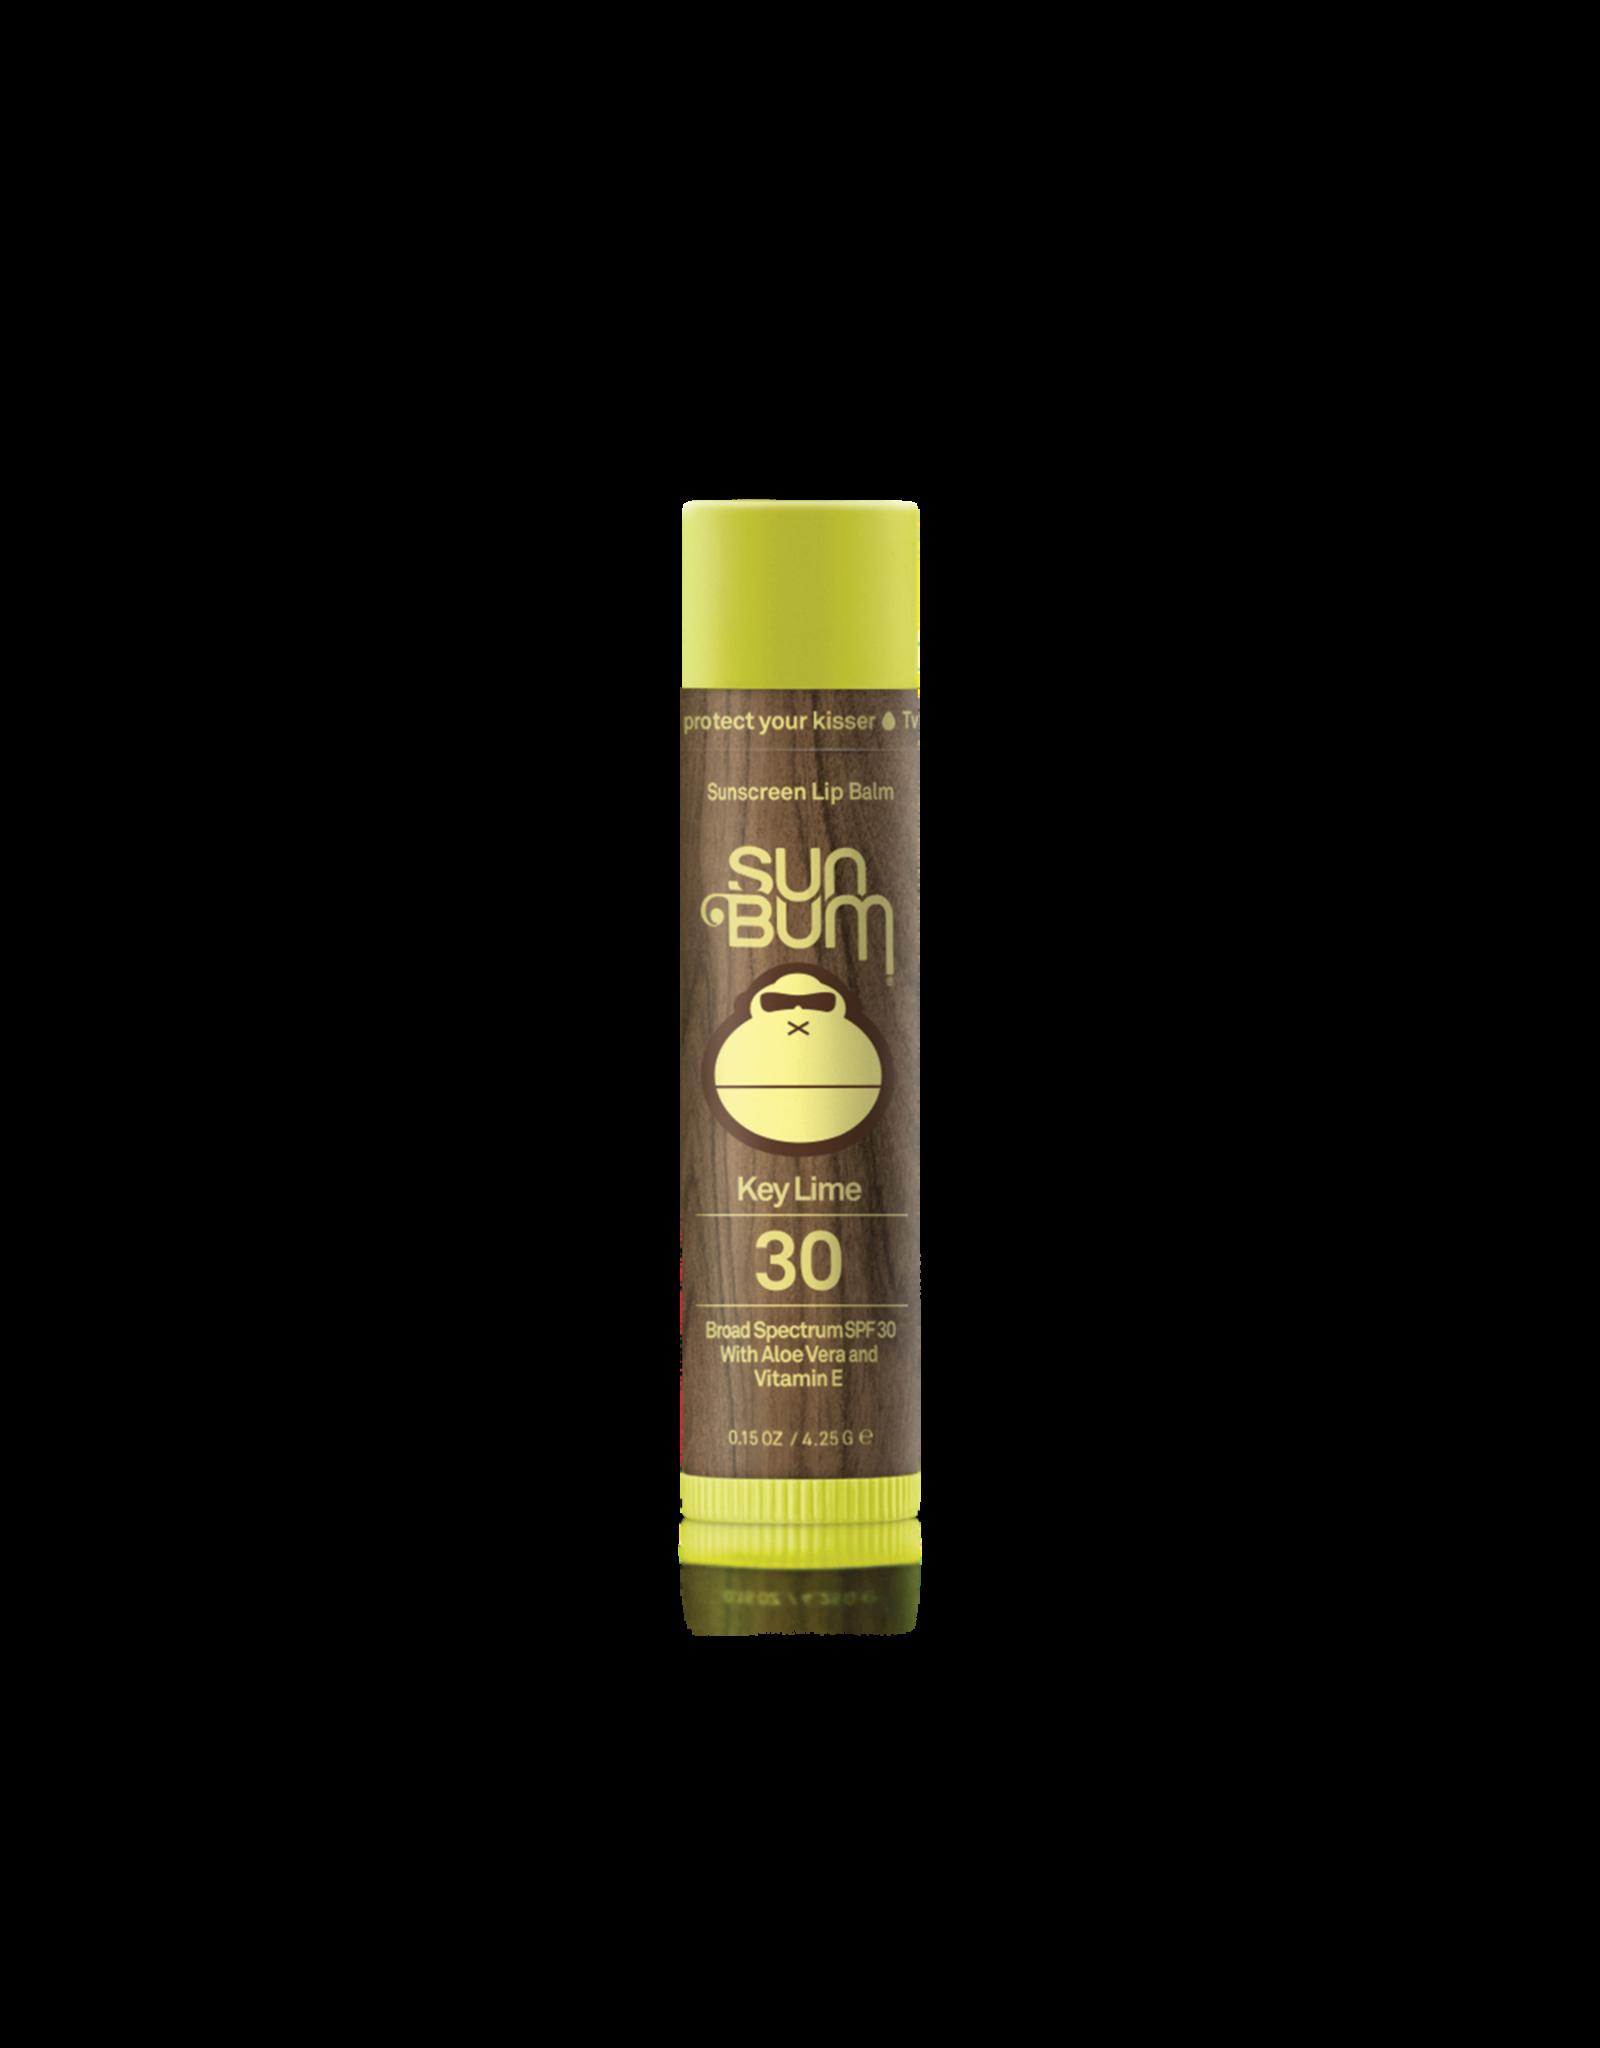 SUN BUM SPF 30 Key Lime Lip Balm